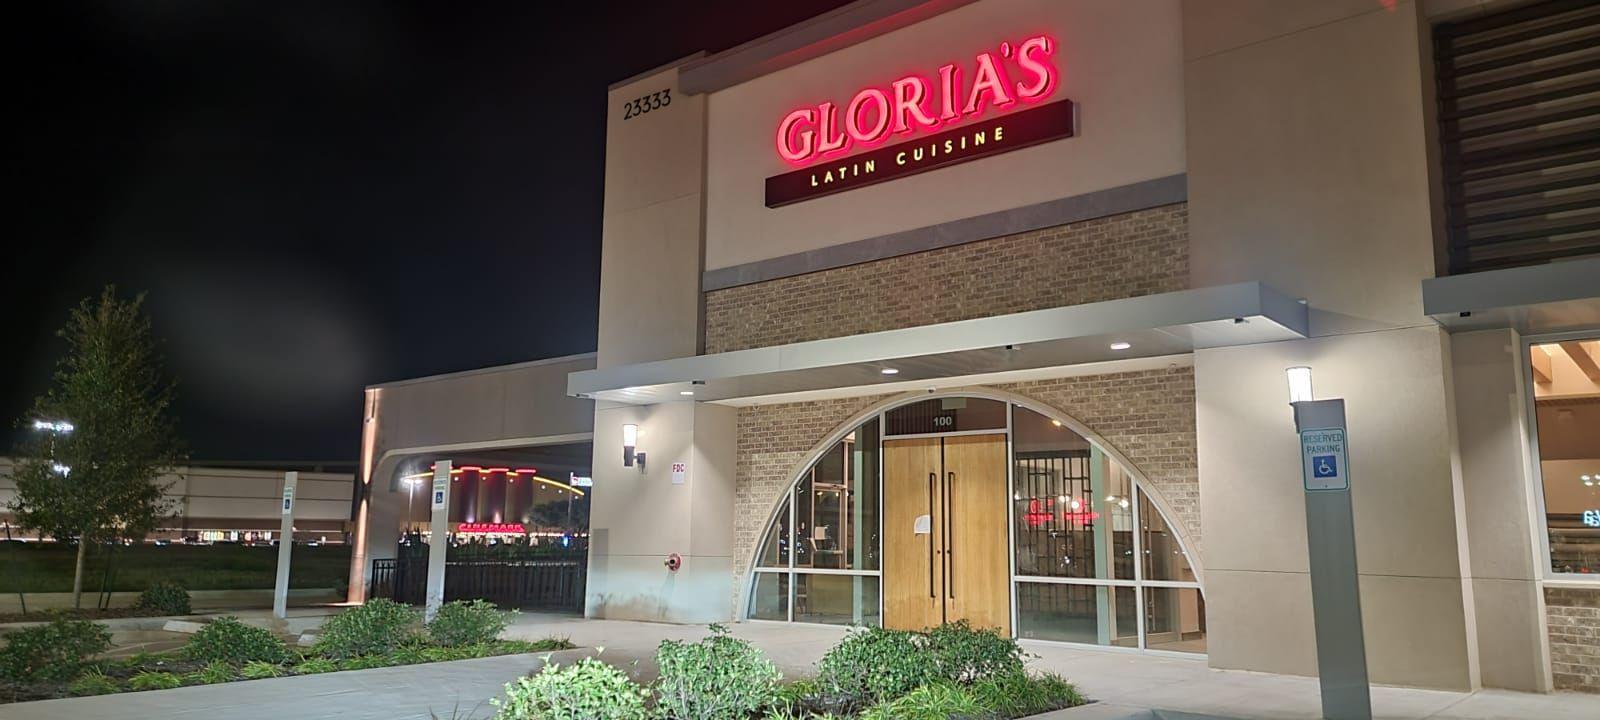 Gloria's Latin Cuisine Opens New Location in Katy, Texas